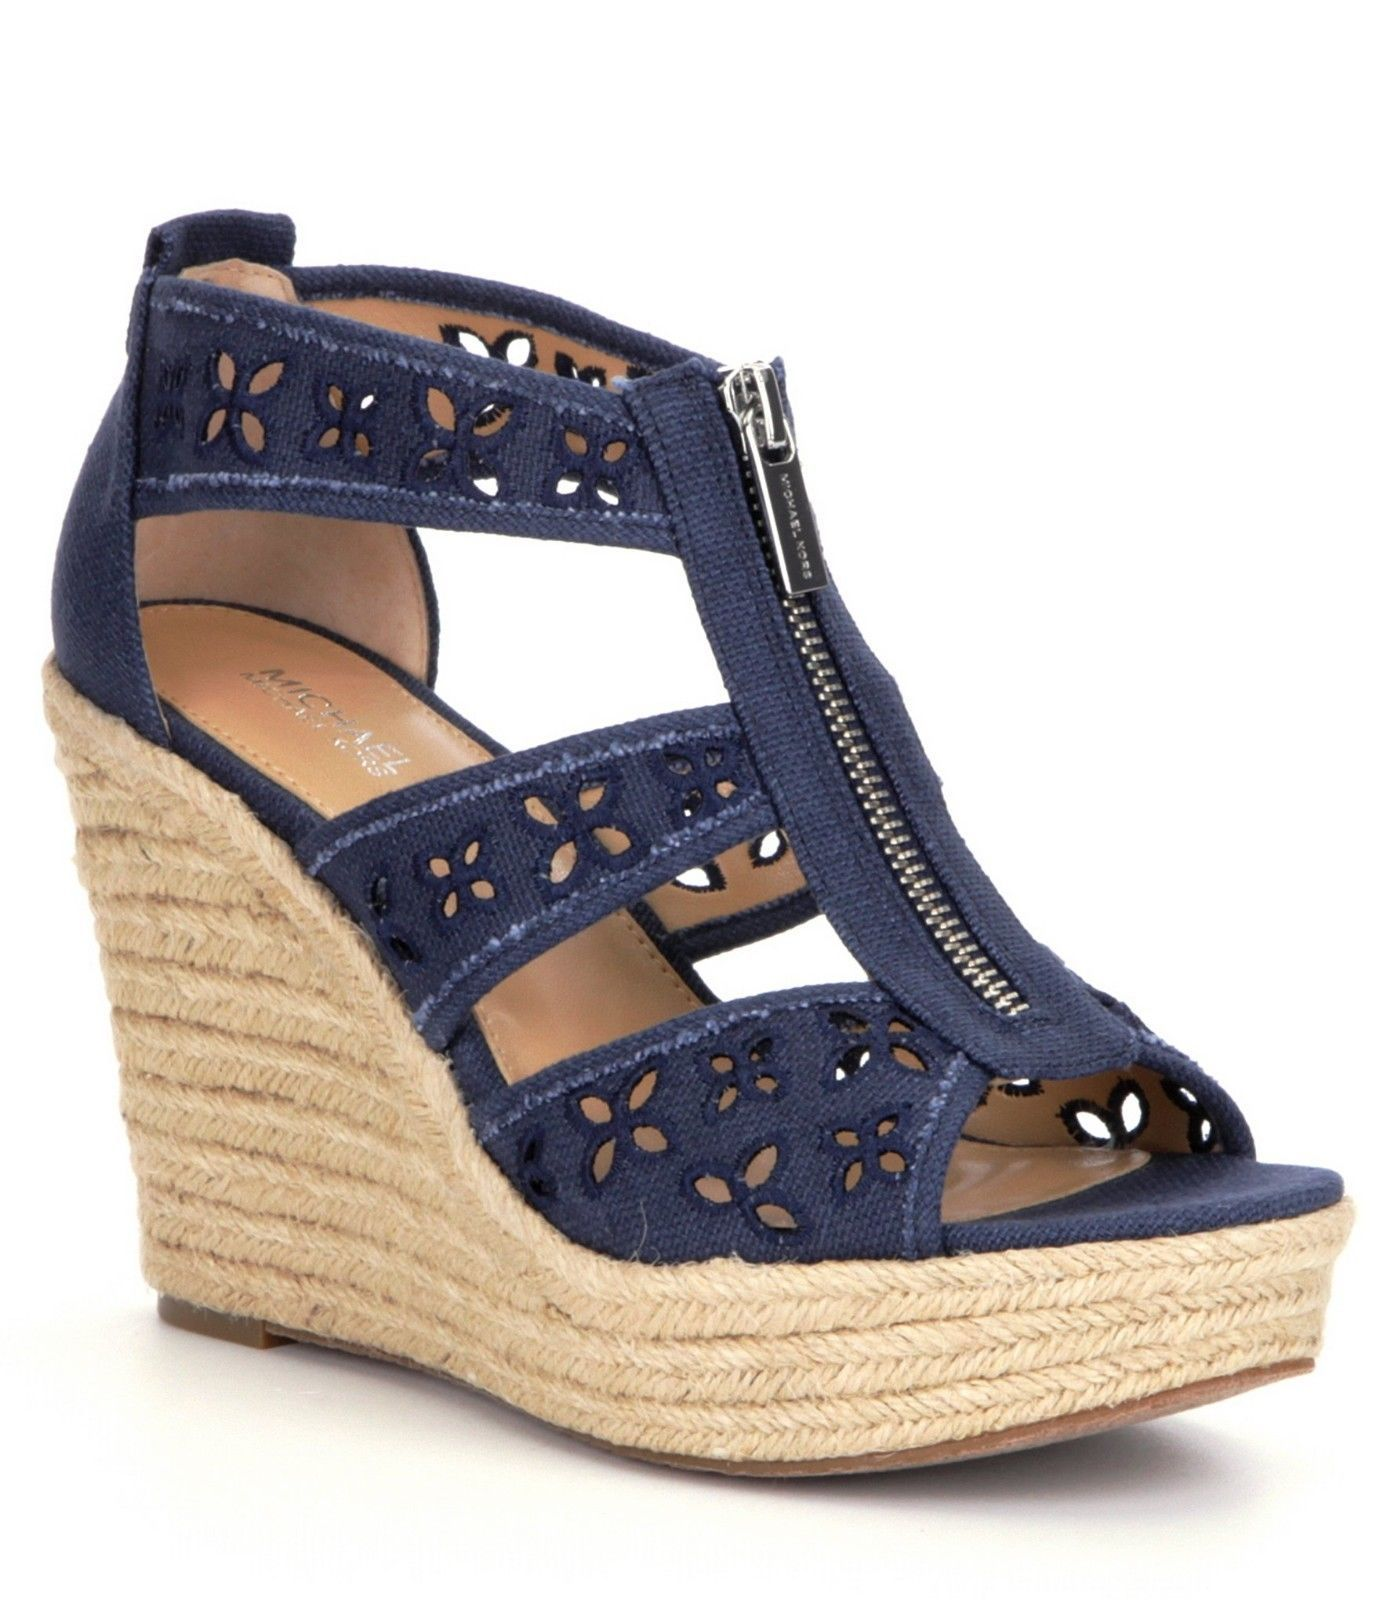 9ef6779cf87b S l1600. S l1600. Previous. Women MICHAEL Michael Kors Damita Floral Wedge  Sandals